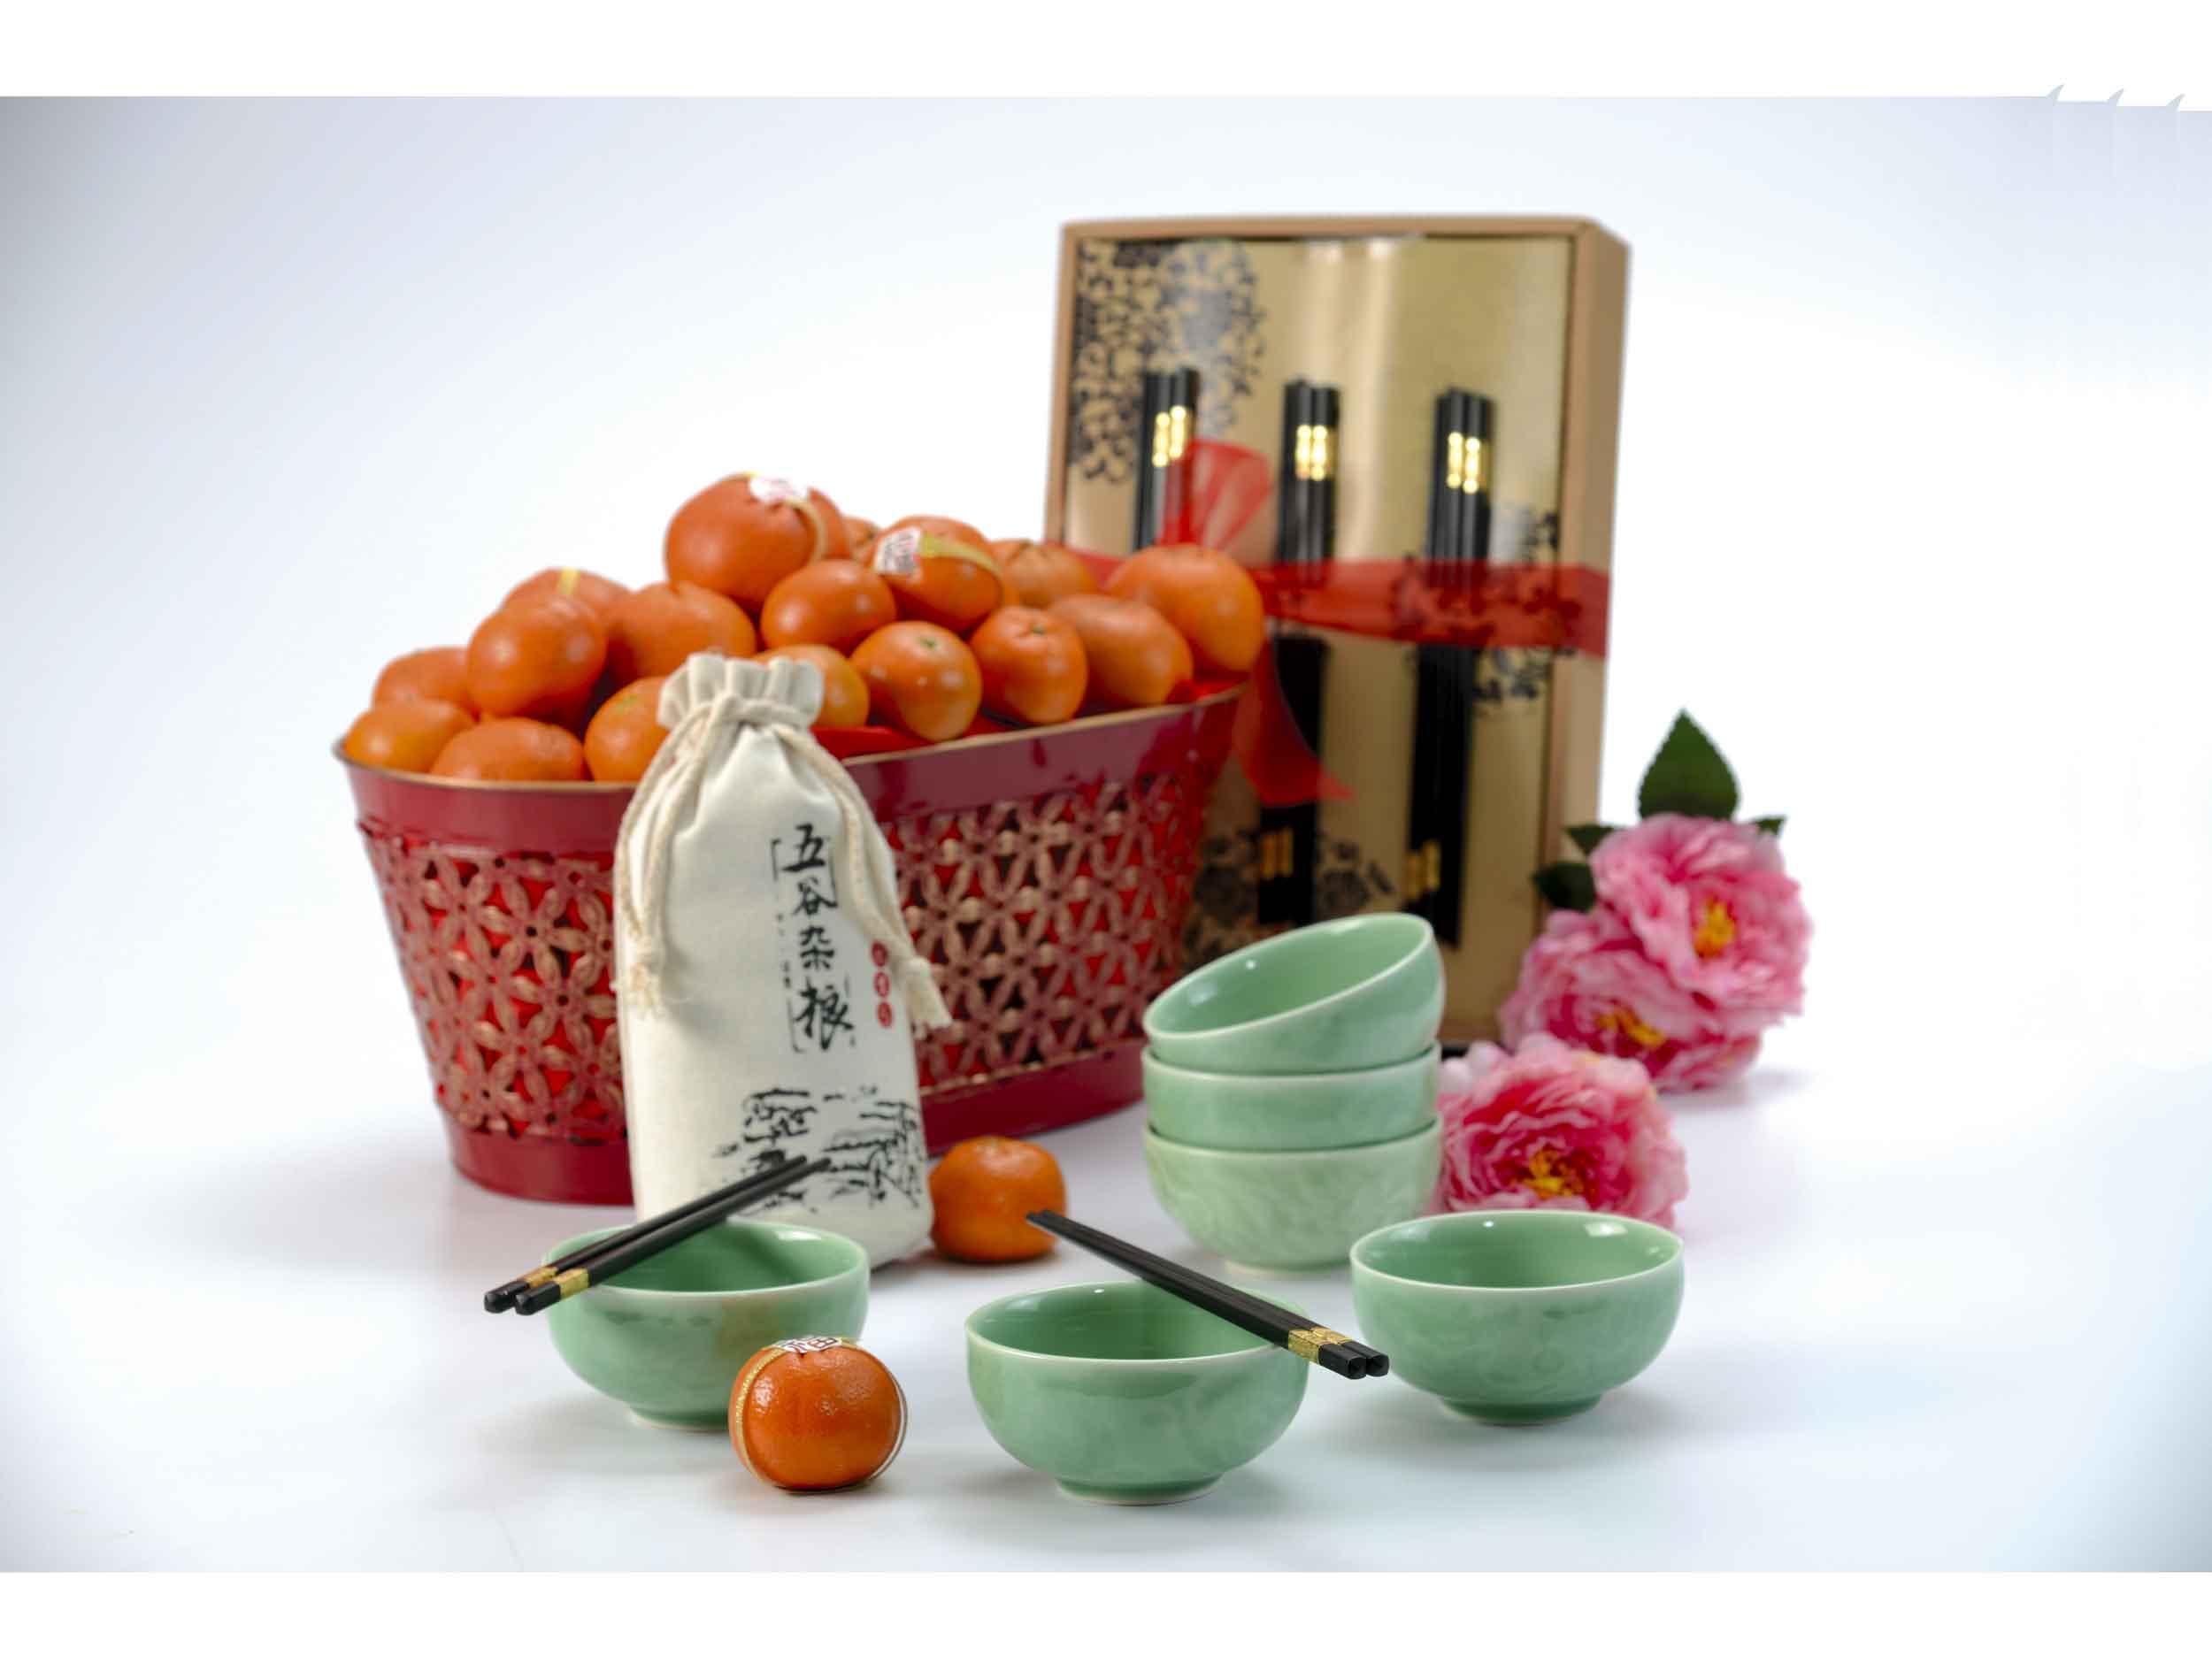 Fortune Abundance with Mandarins | Chinese New Year Hampers & Gifts | Eska Creative Gifting